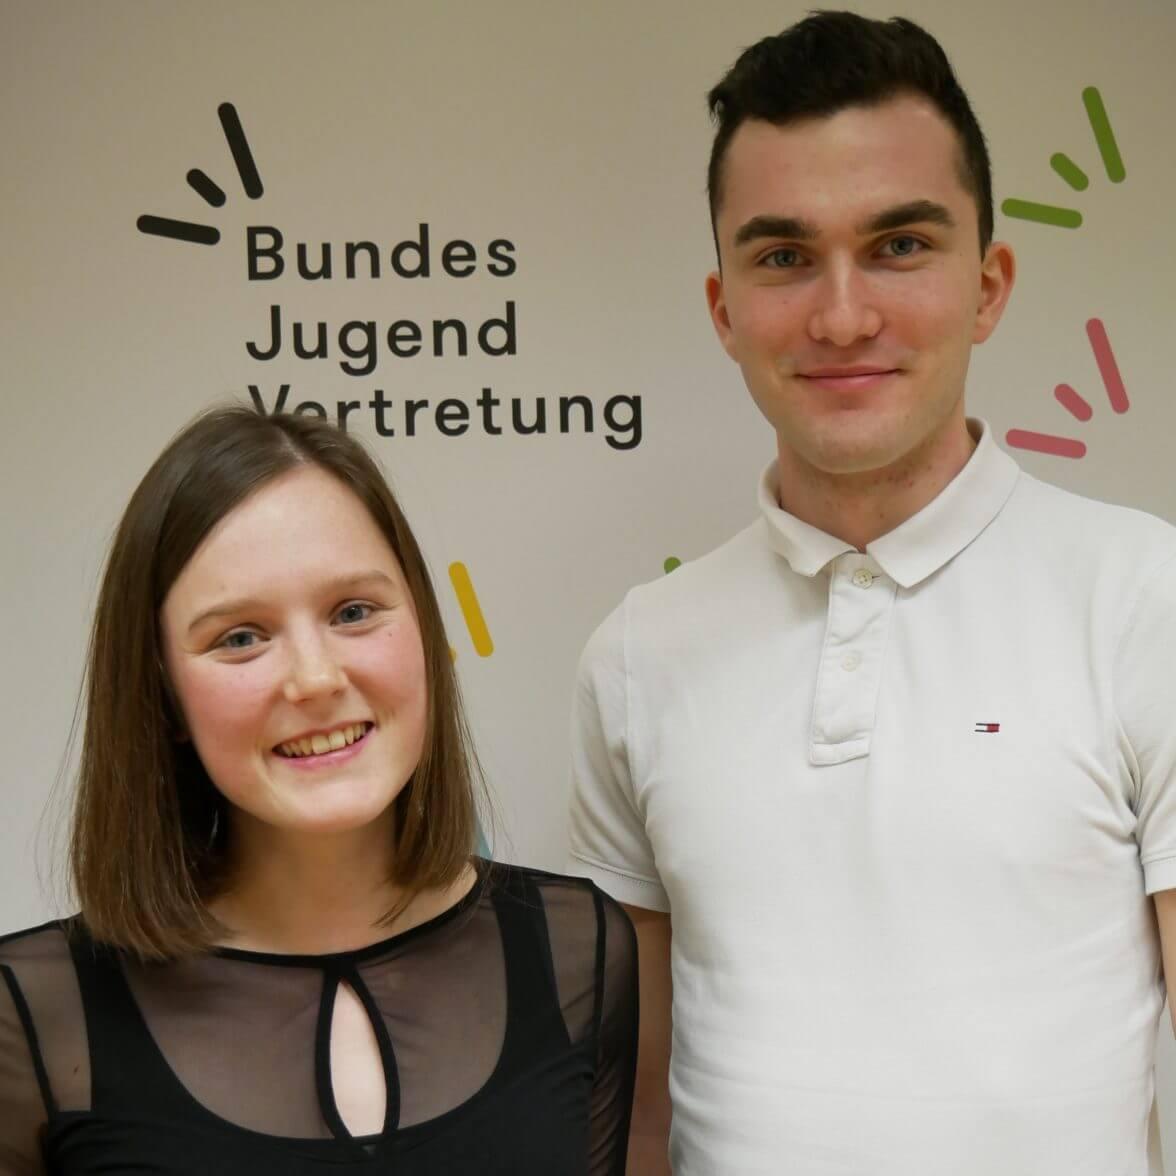 European Youth Delegates Hannah und Johannes